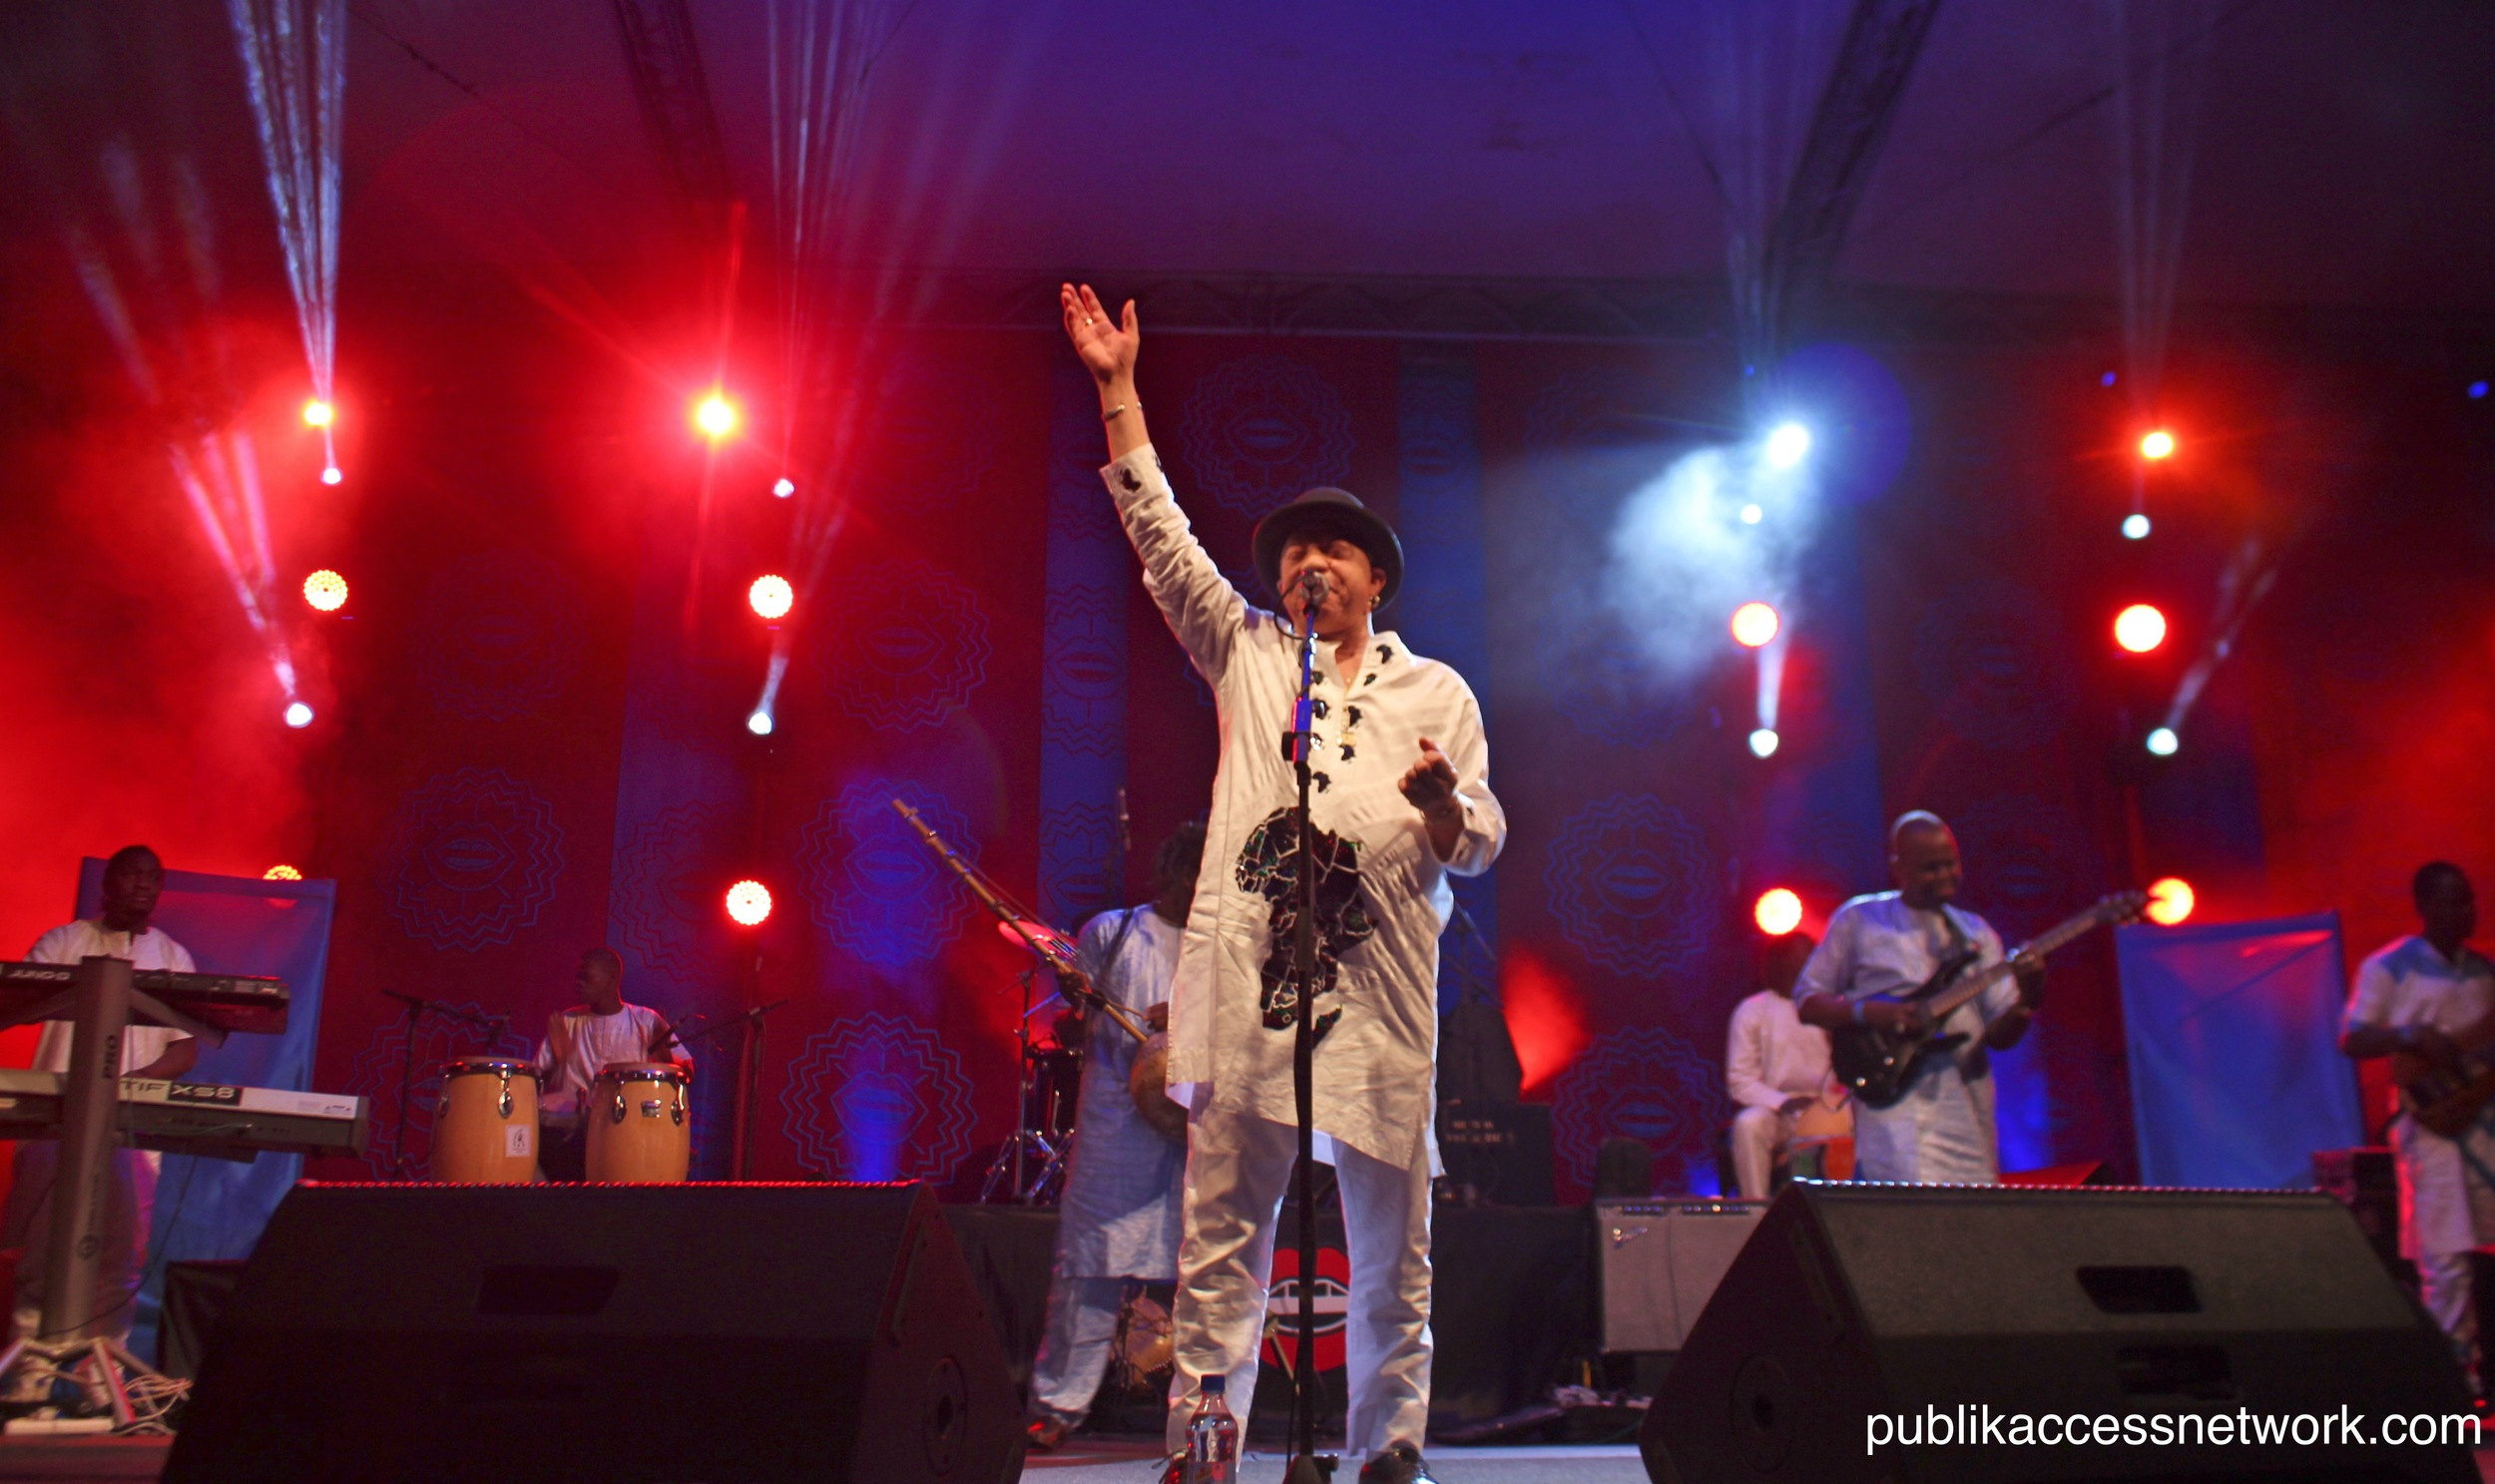 Salif Keita salutes the crowd